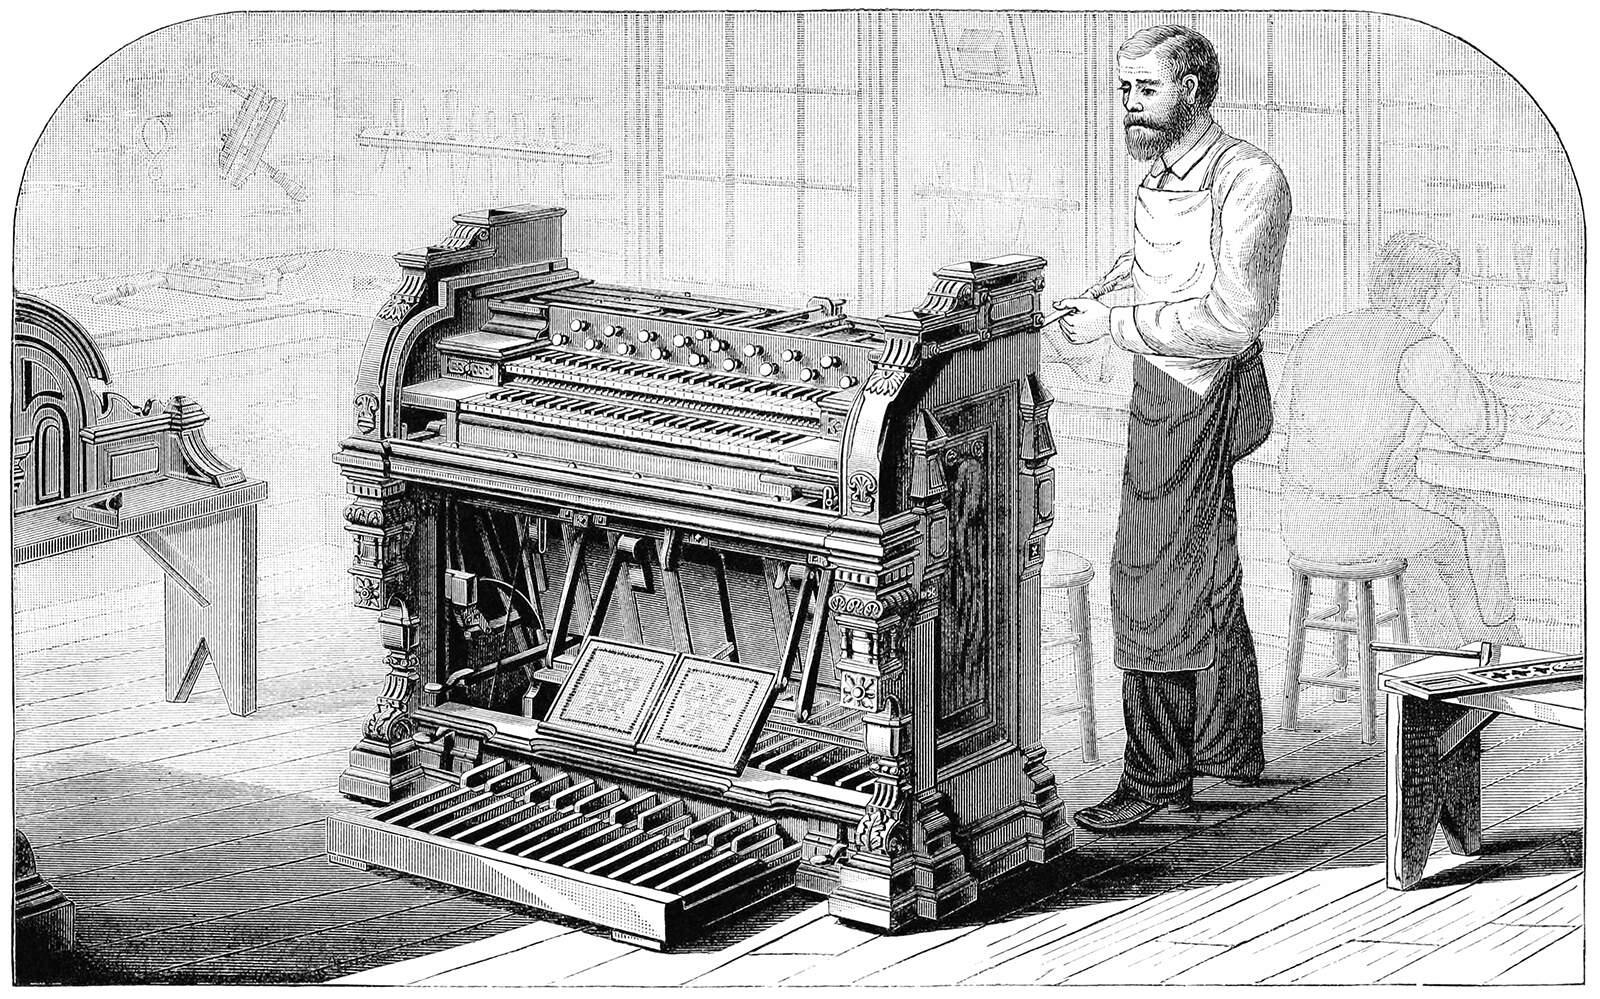 A handmade organ